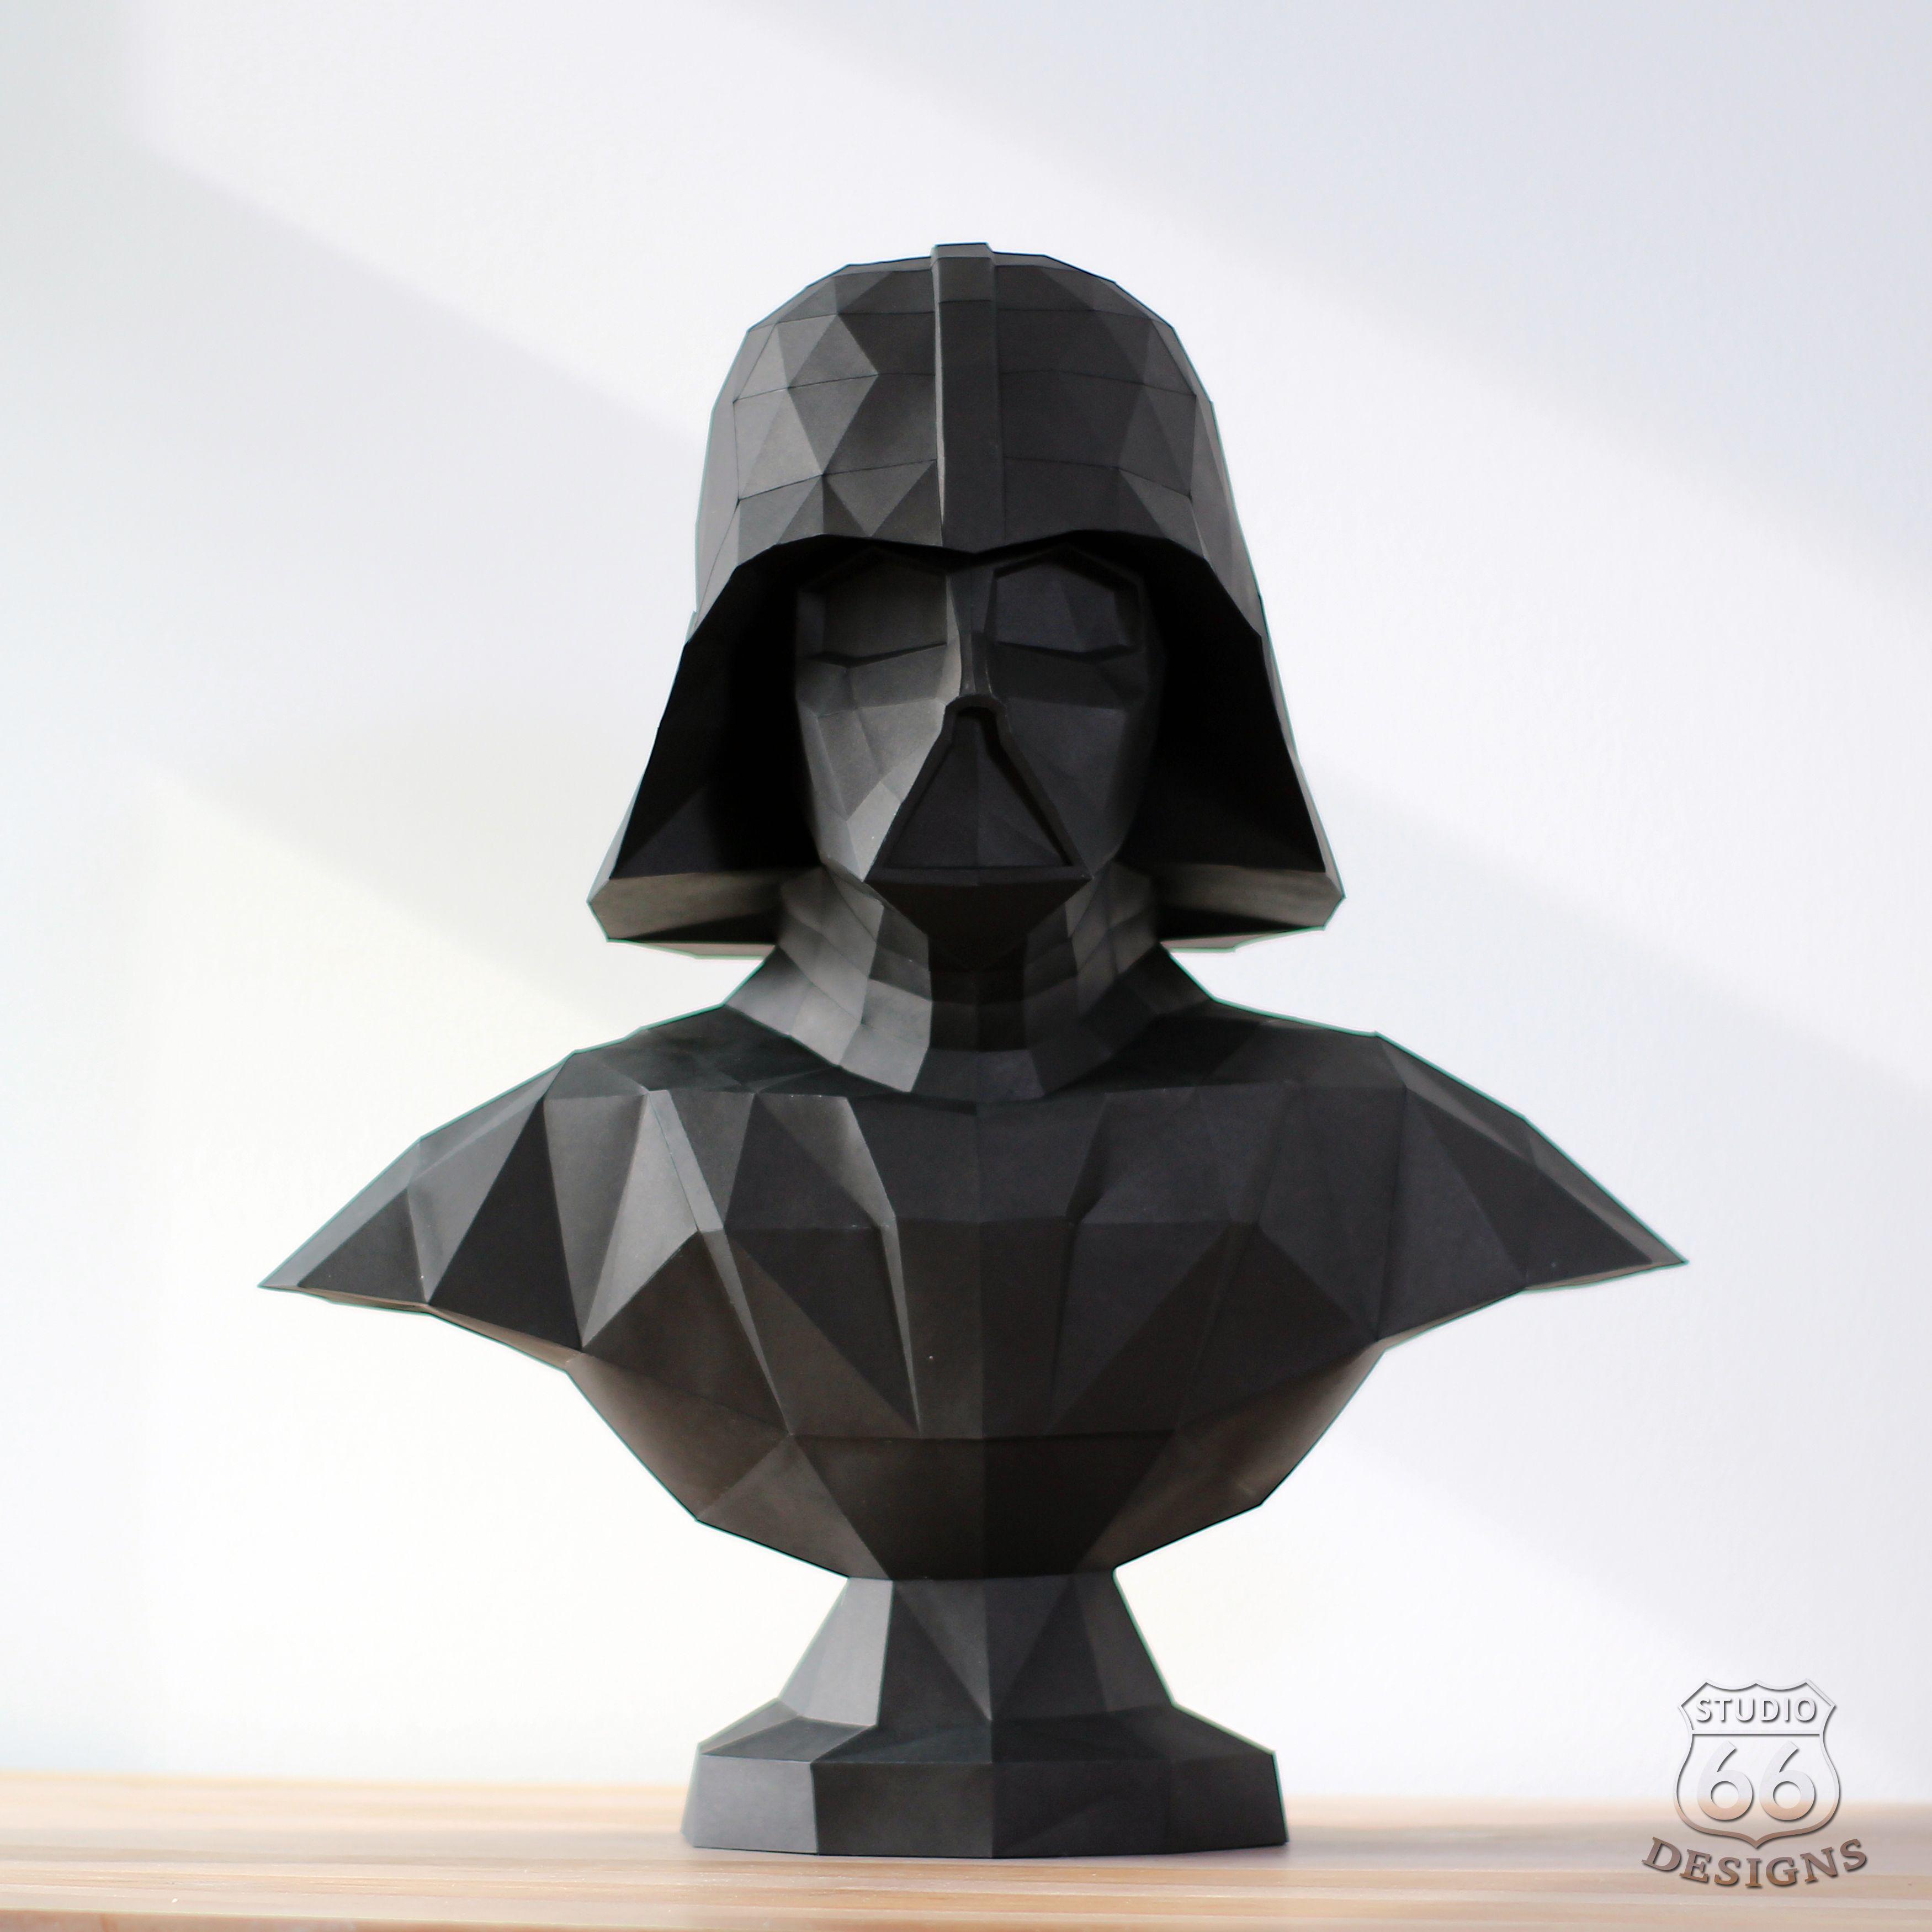 Darth Vader Papercraft Posted On Reddit R StarWars